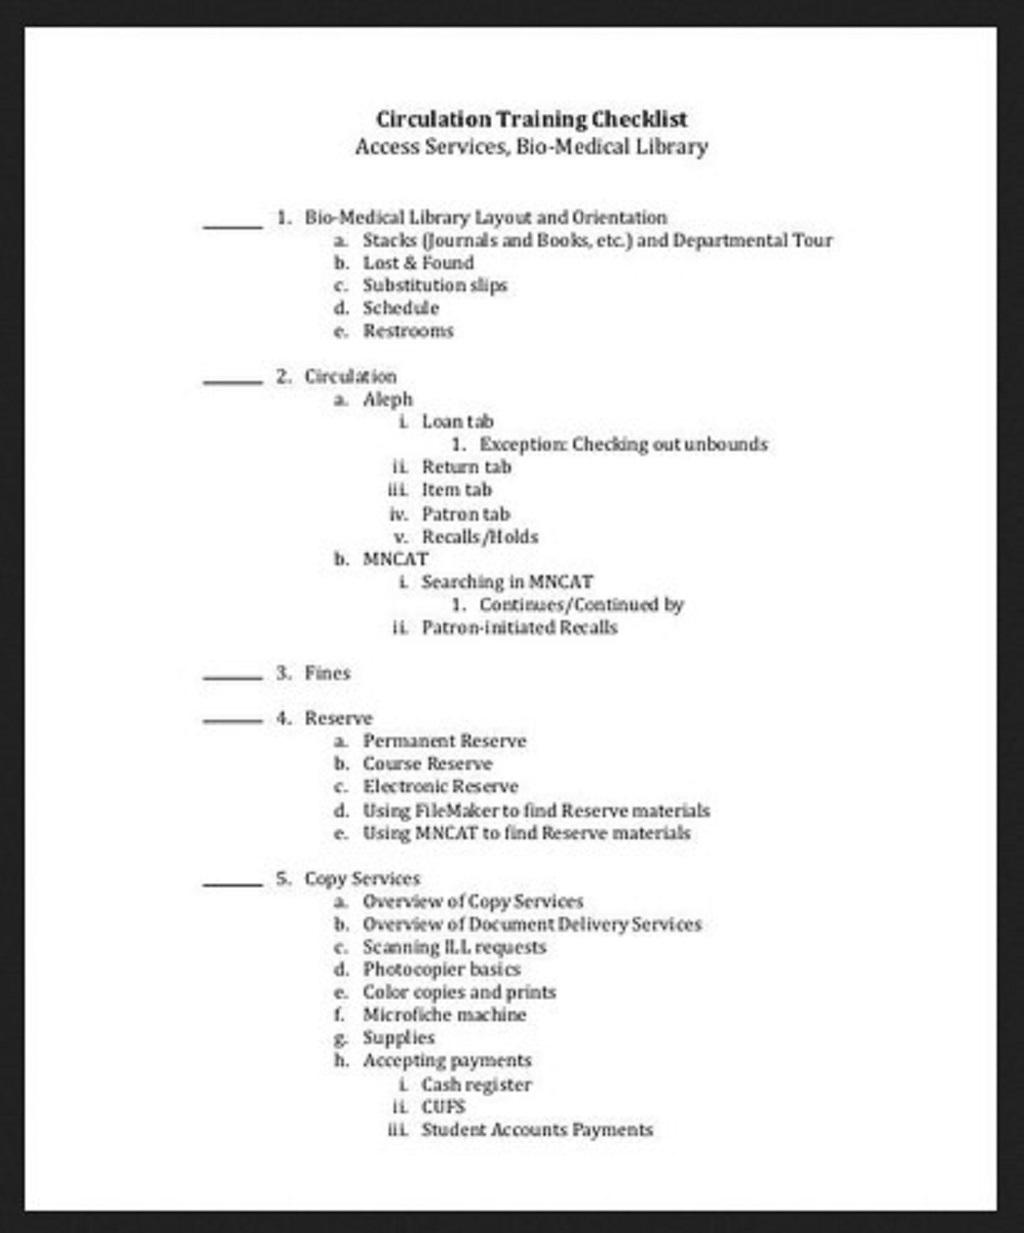 Circulation Training Checklist Sample Employee Word Pdf Template Google Docs  Samples Large